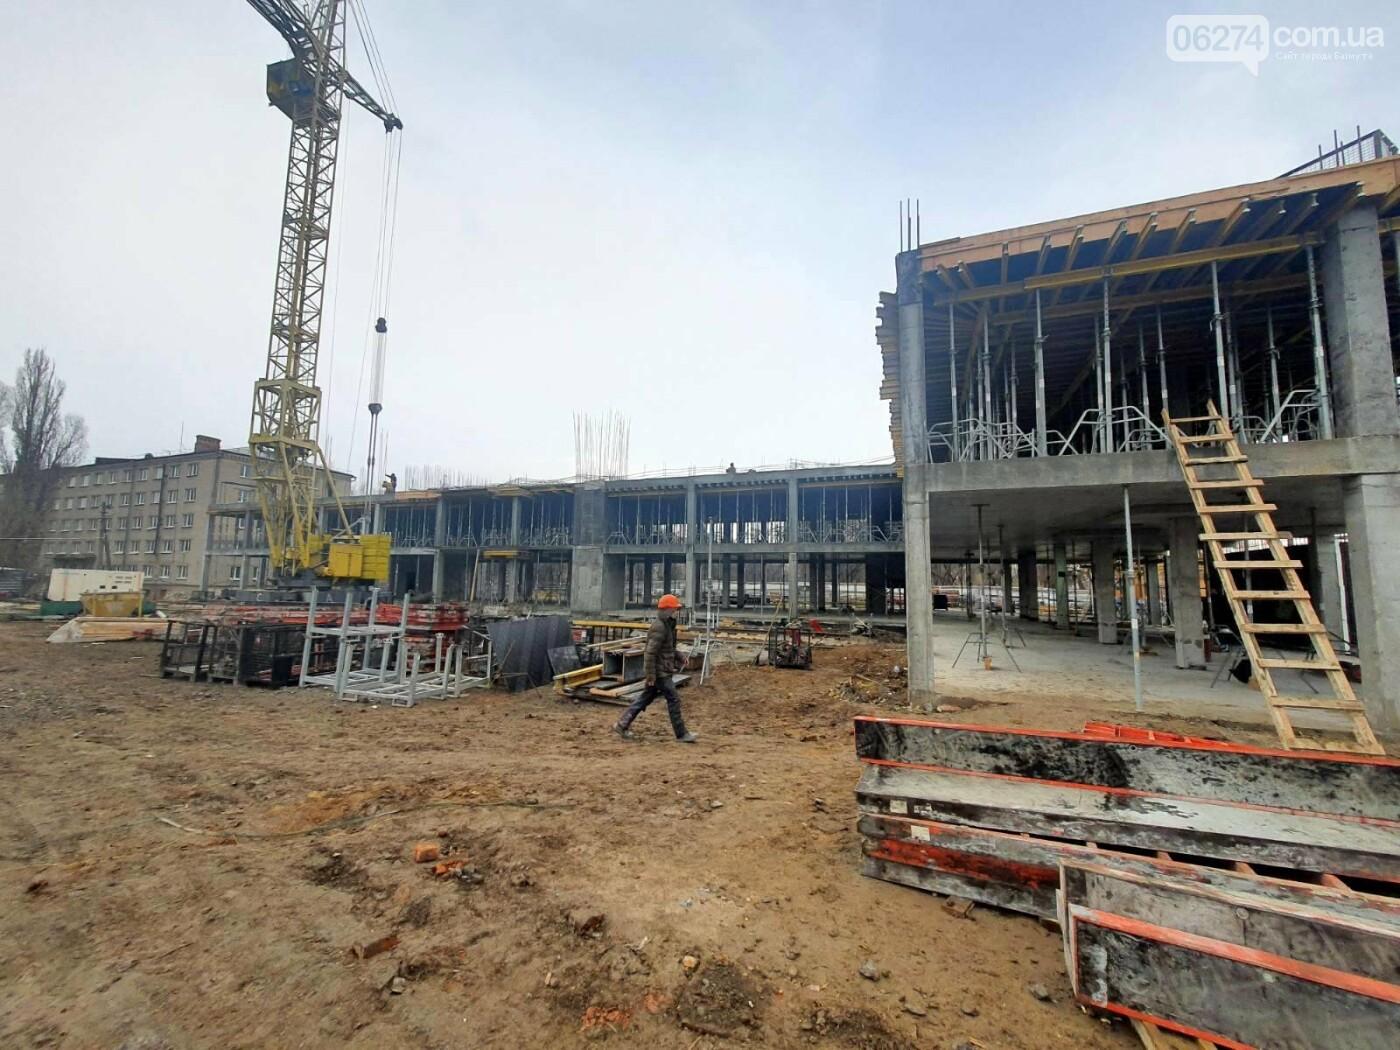 В Бахмуте начали возведение этажей учебного корпуса спортивного колледжа им. С. Бубки, фото-1